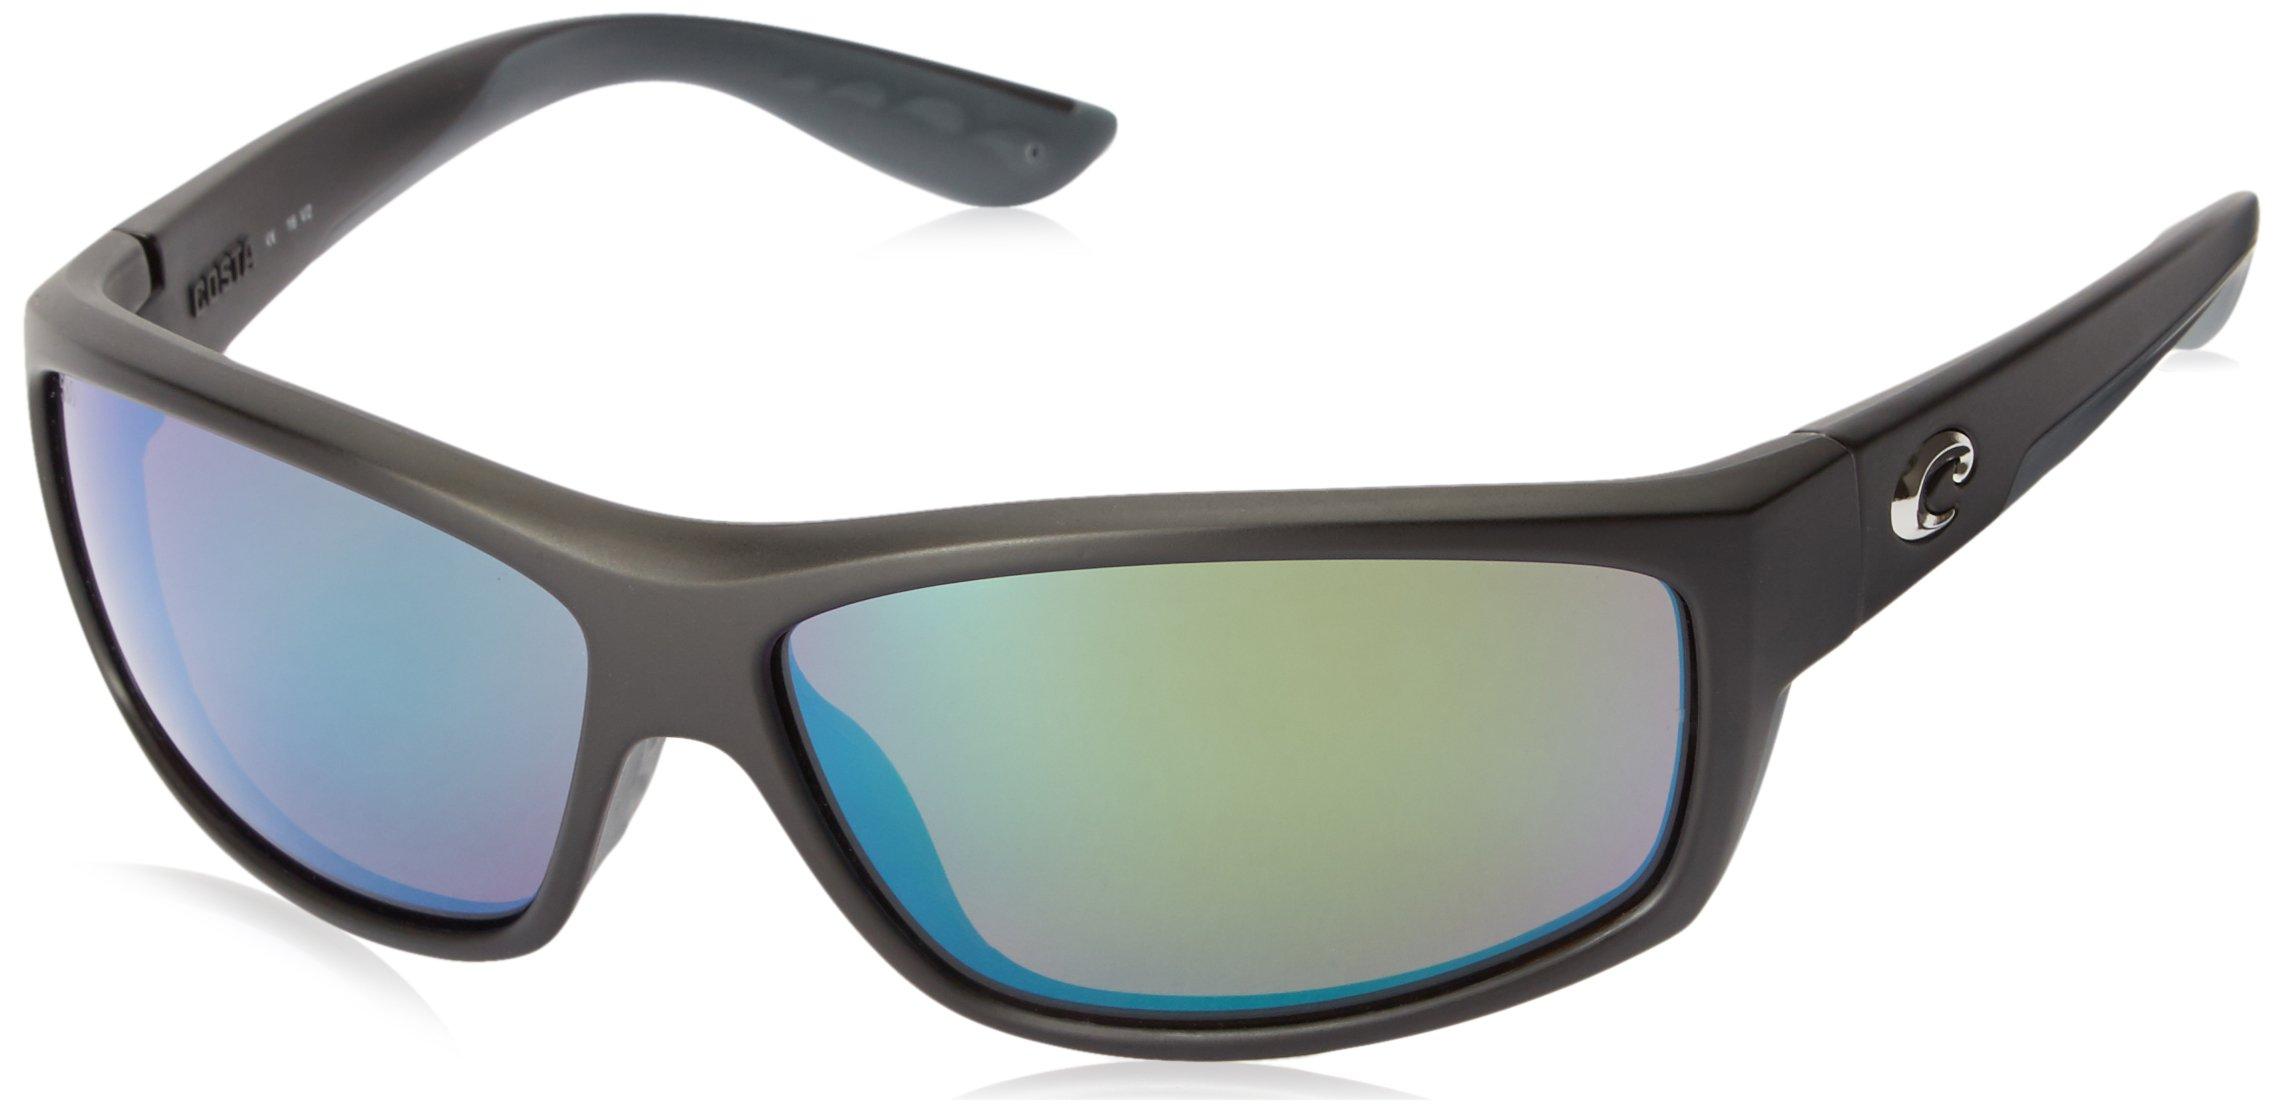 Costa del Mar Unisex-Adult Saltbreak BK 11 OGMGLP Polarized Iridium Wrap Sunglasses, black, 64.5 mm by Costa Del Mar